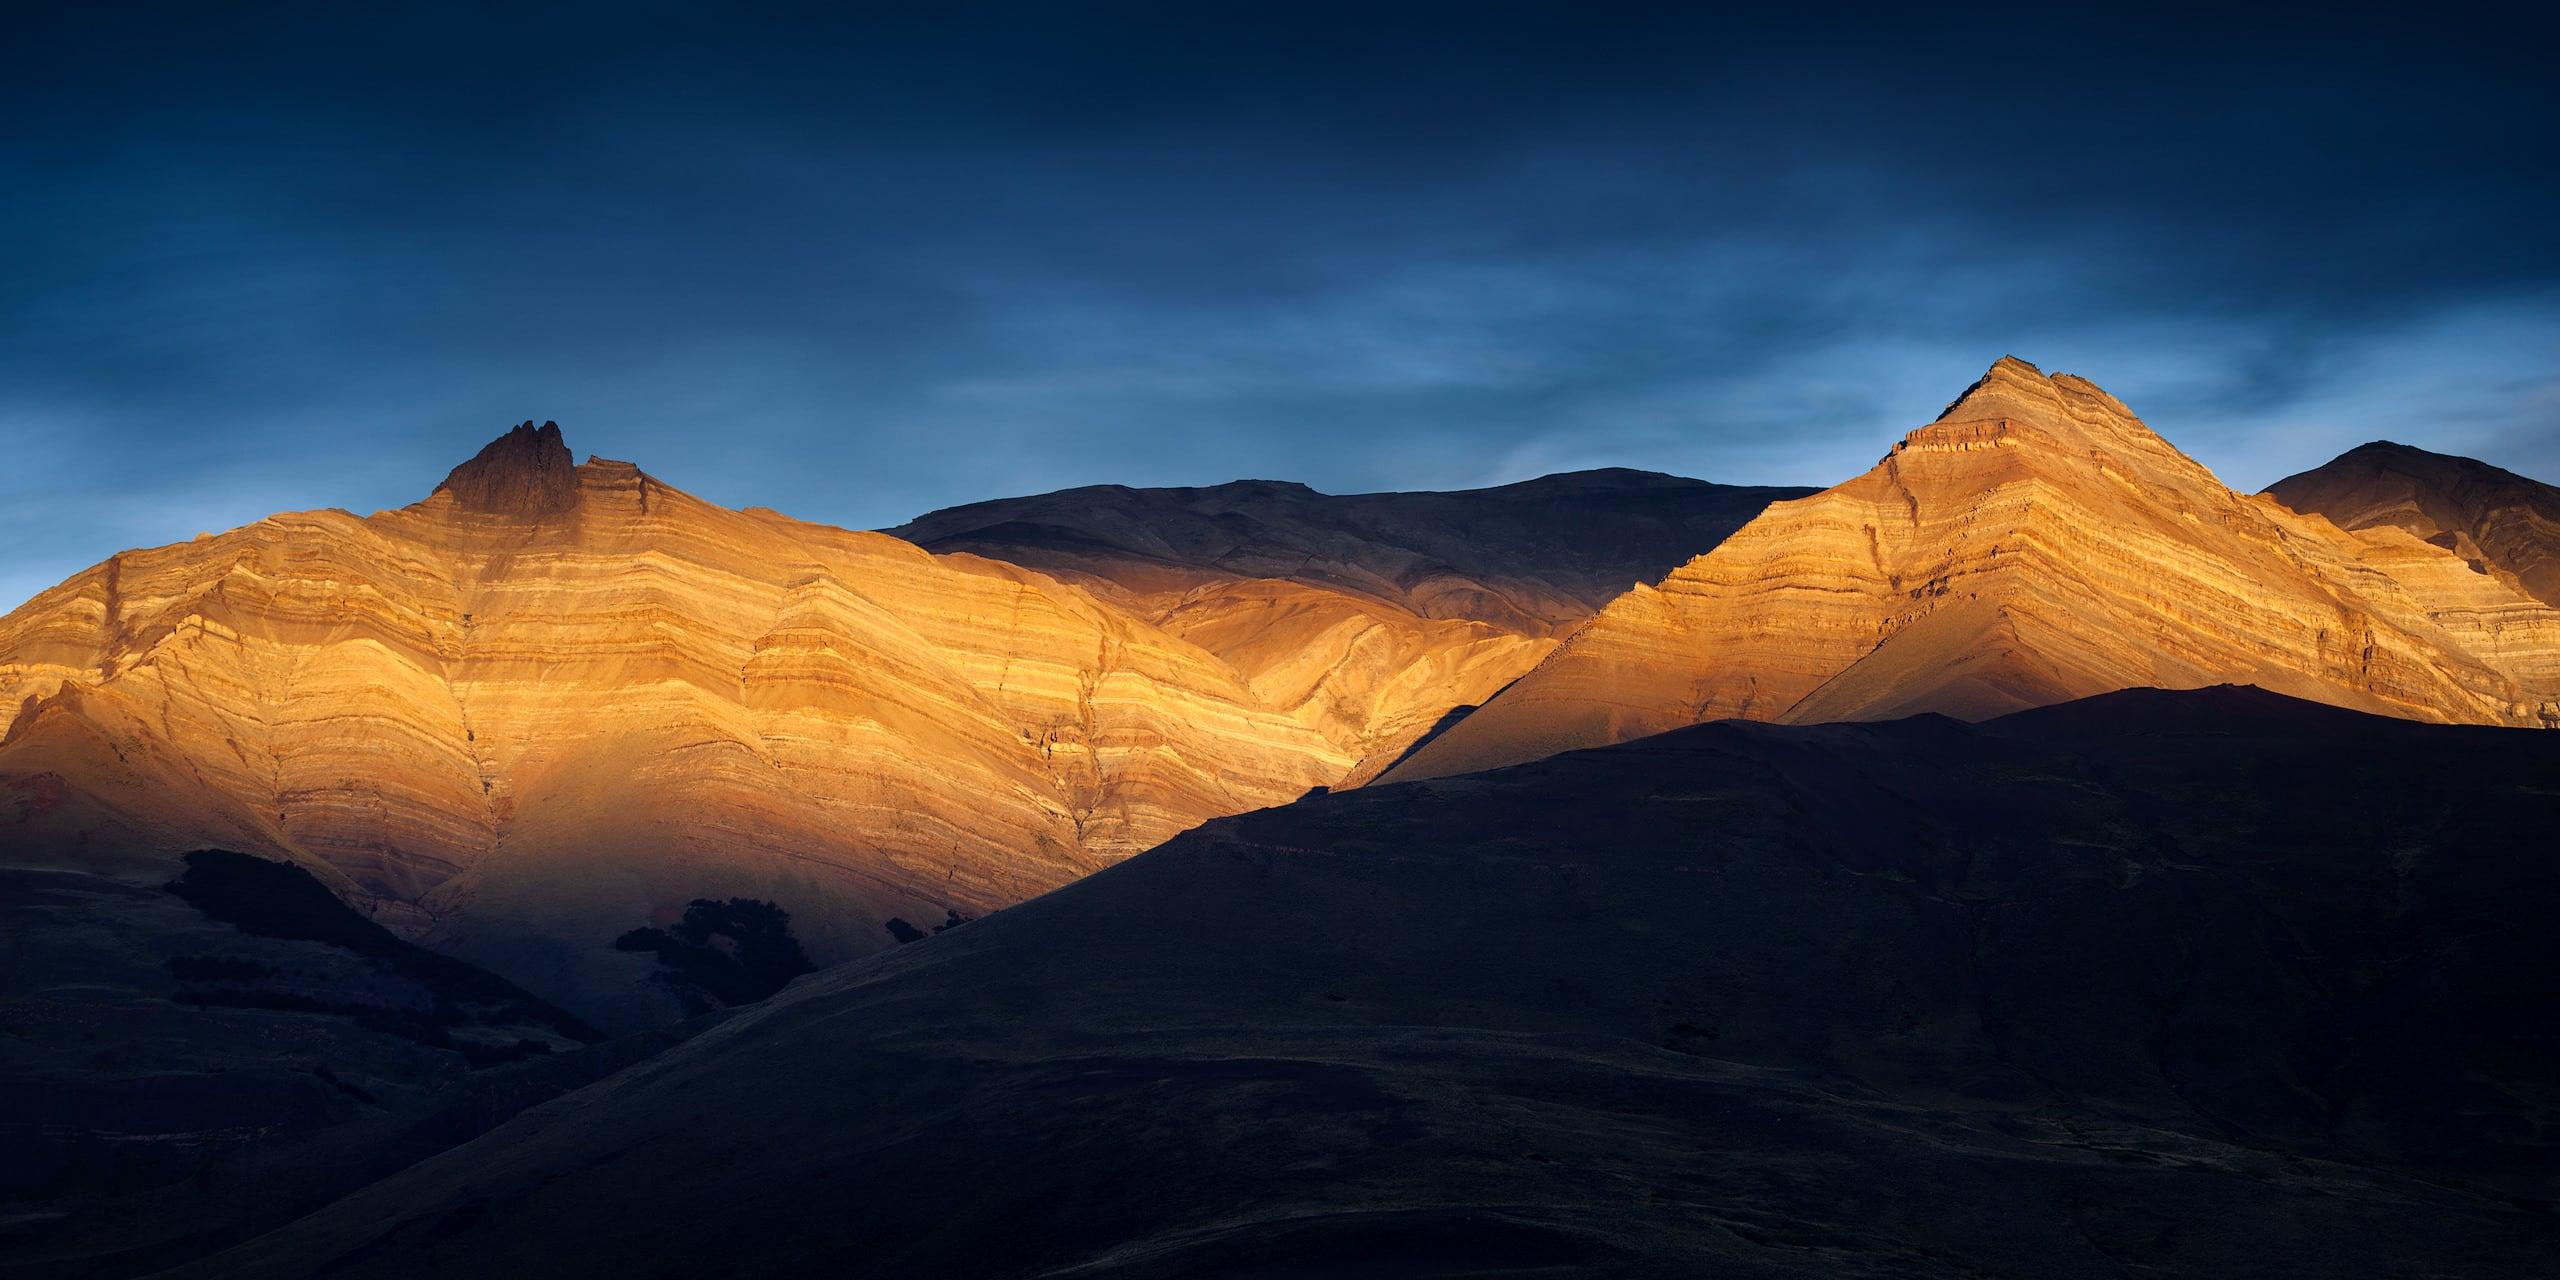 Sunset on the mountains surrounding El Chaltén